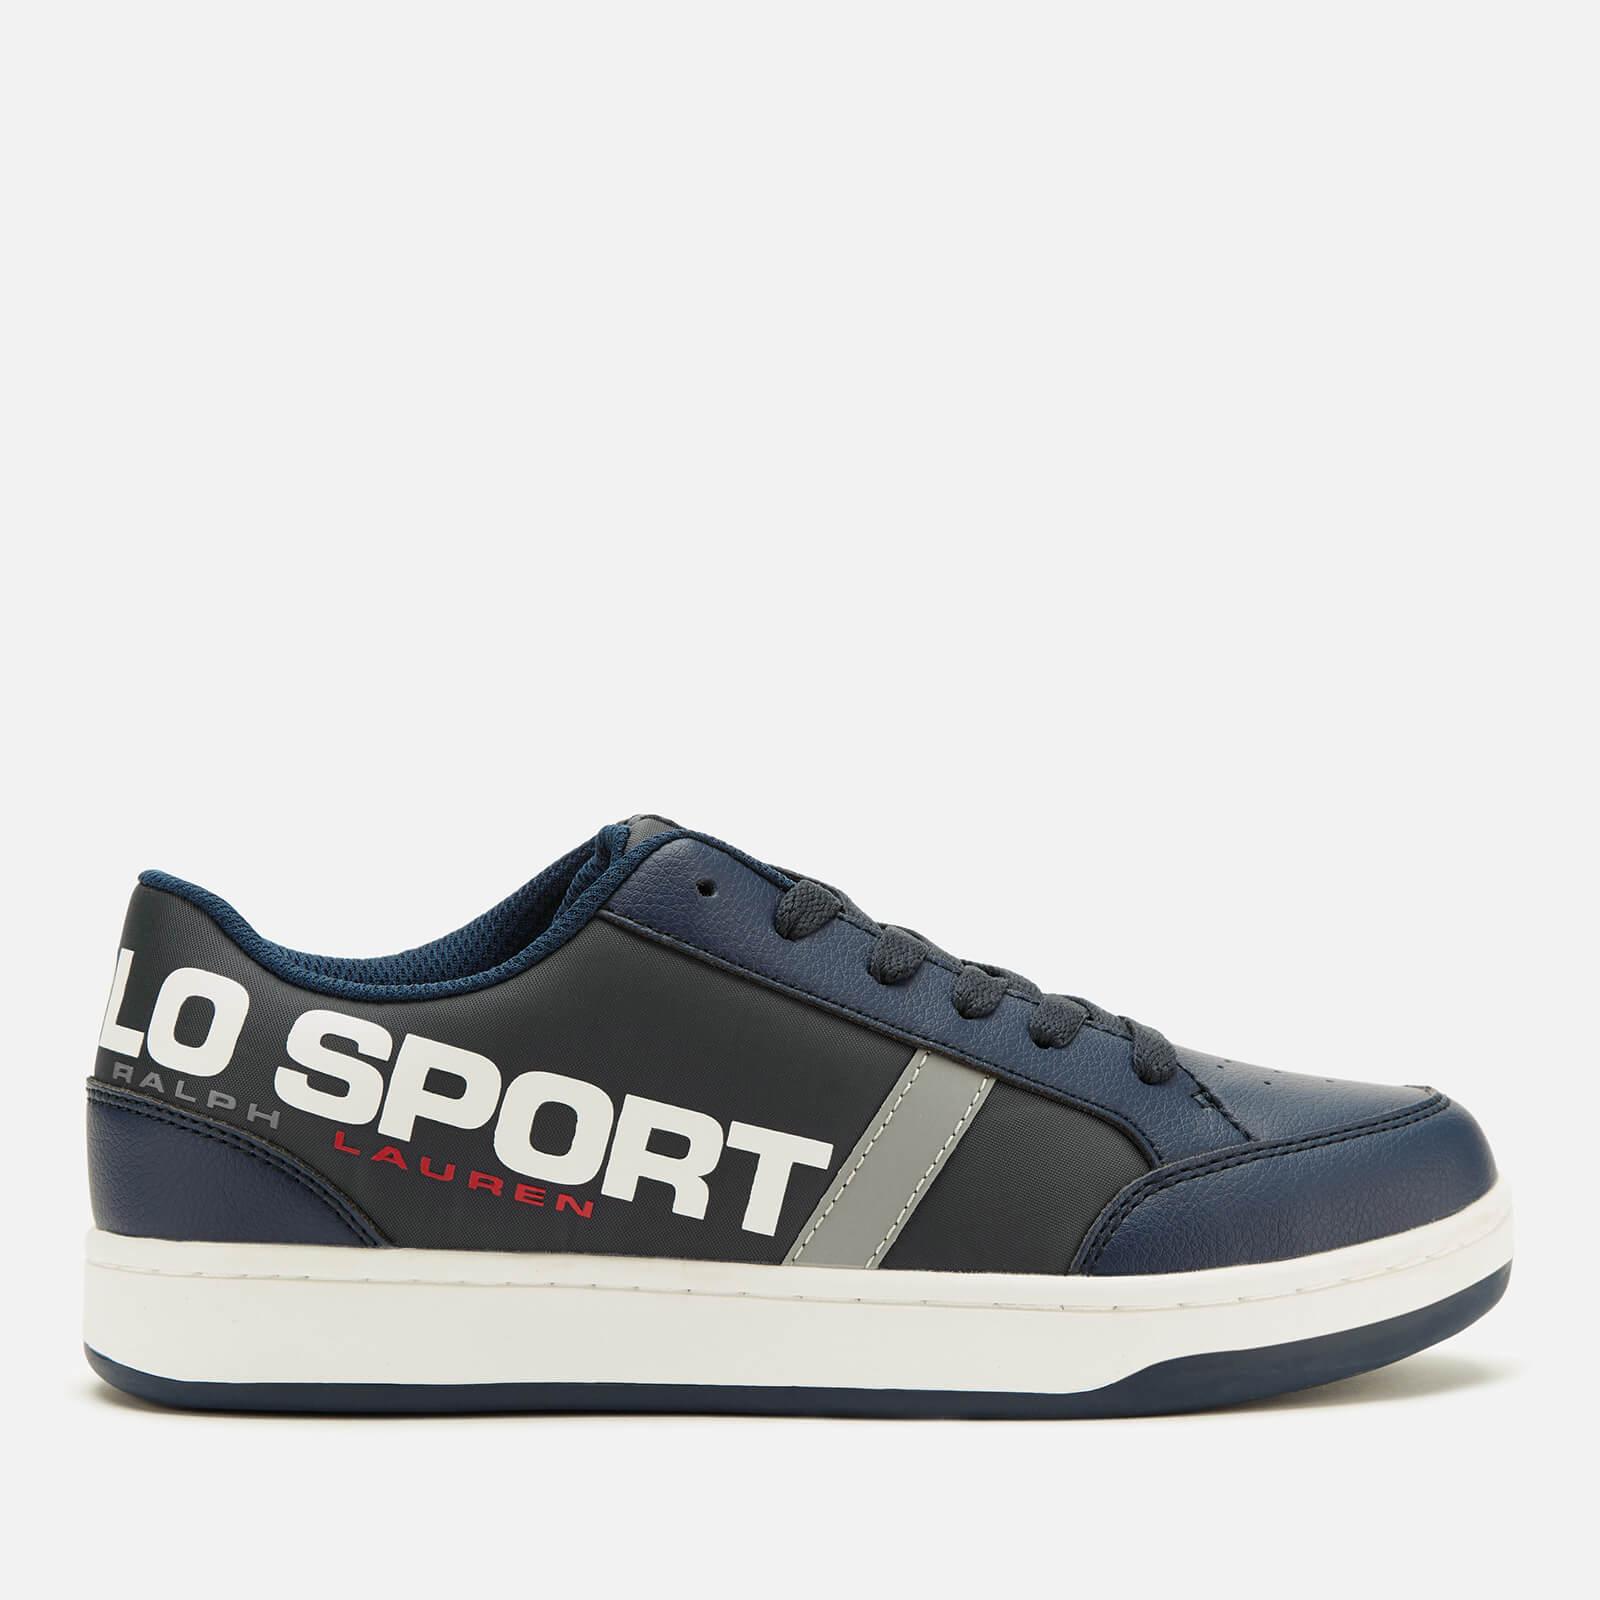 Ralph Lauren Polo Ralph Lauren Kids' Belden Polo Sport Low Top Trainers - Navy/Silver - UK 3.5 Kids/EU 35 - Blue